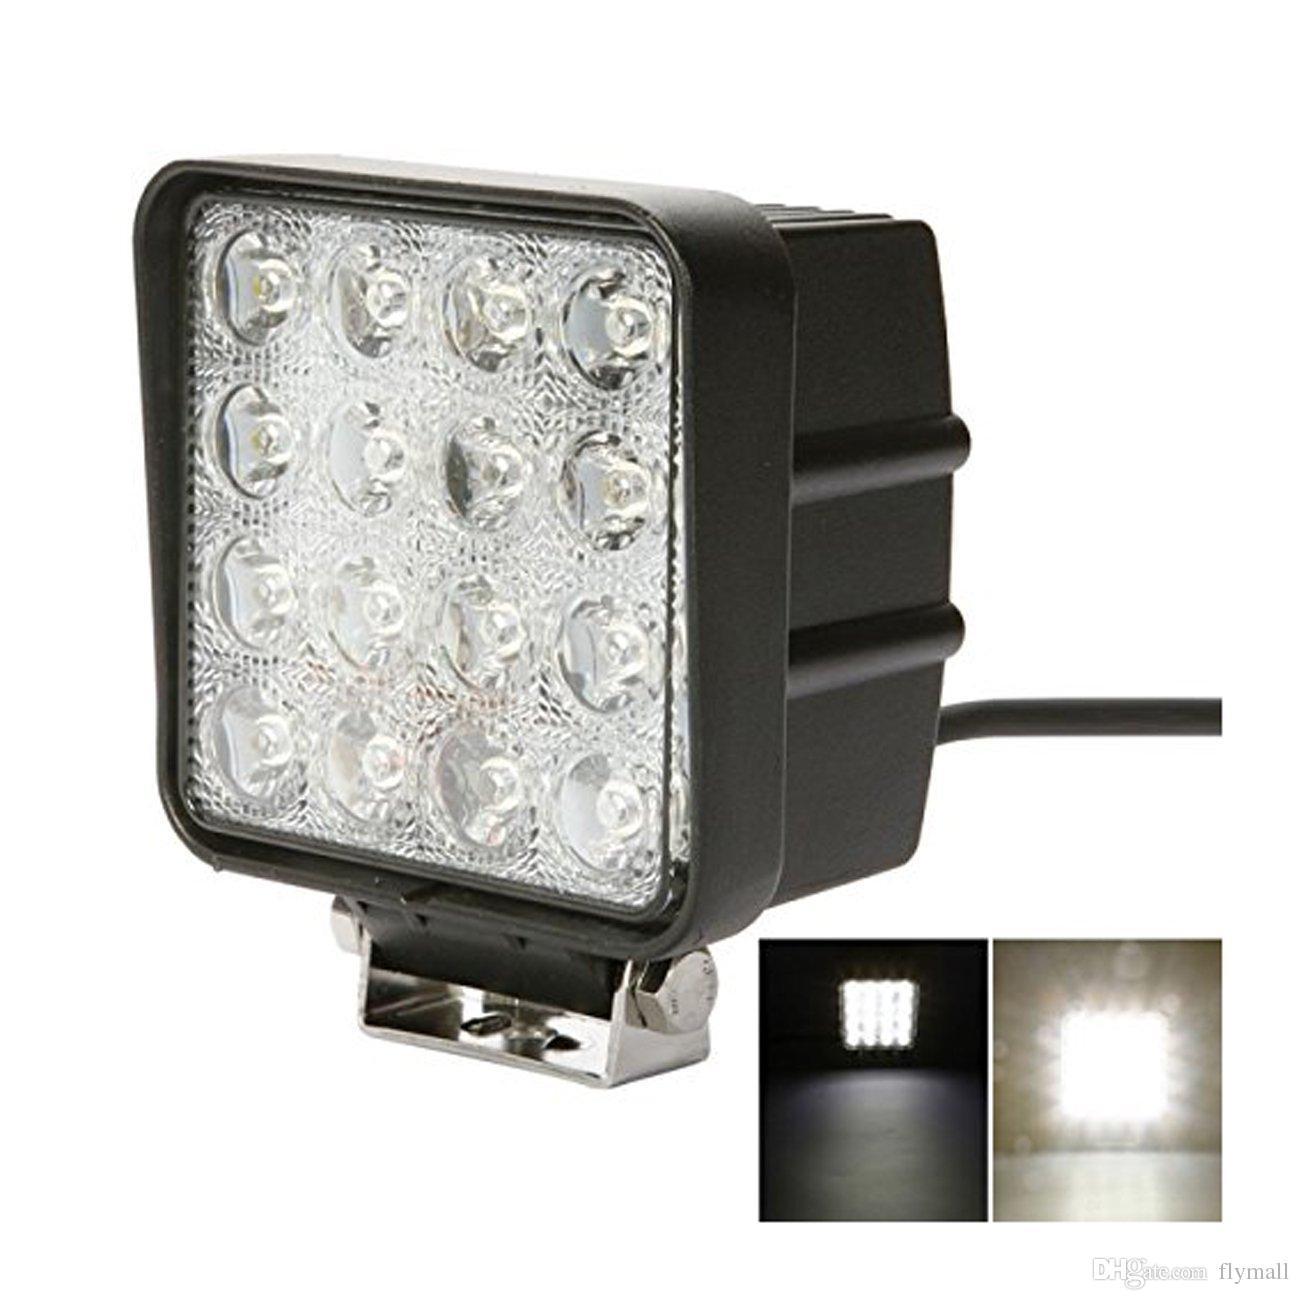 hight resolution of 4 inch square 48w led work light off road flood lights truck lights cap light besides square led fog lights on 4 led shop light wiring